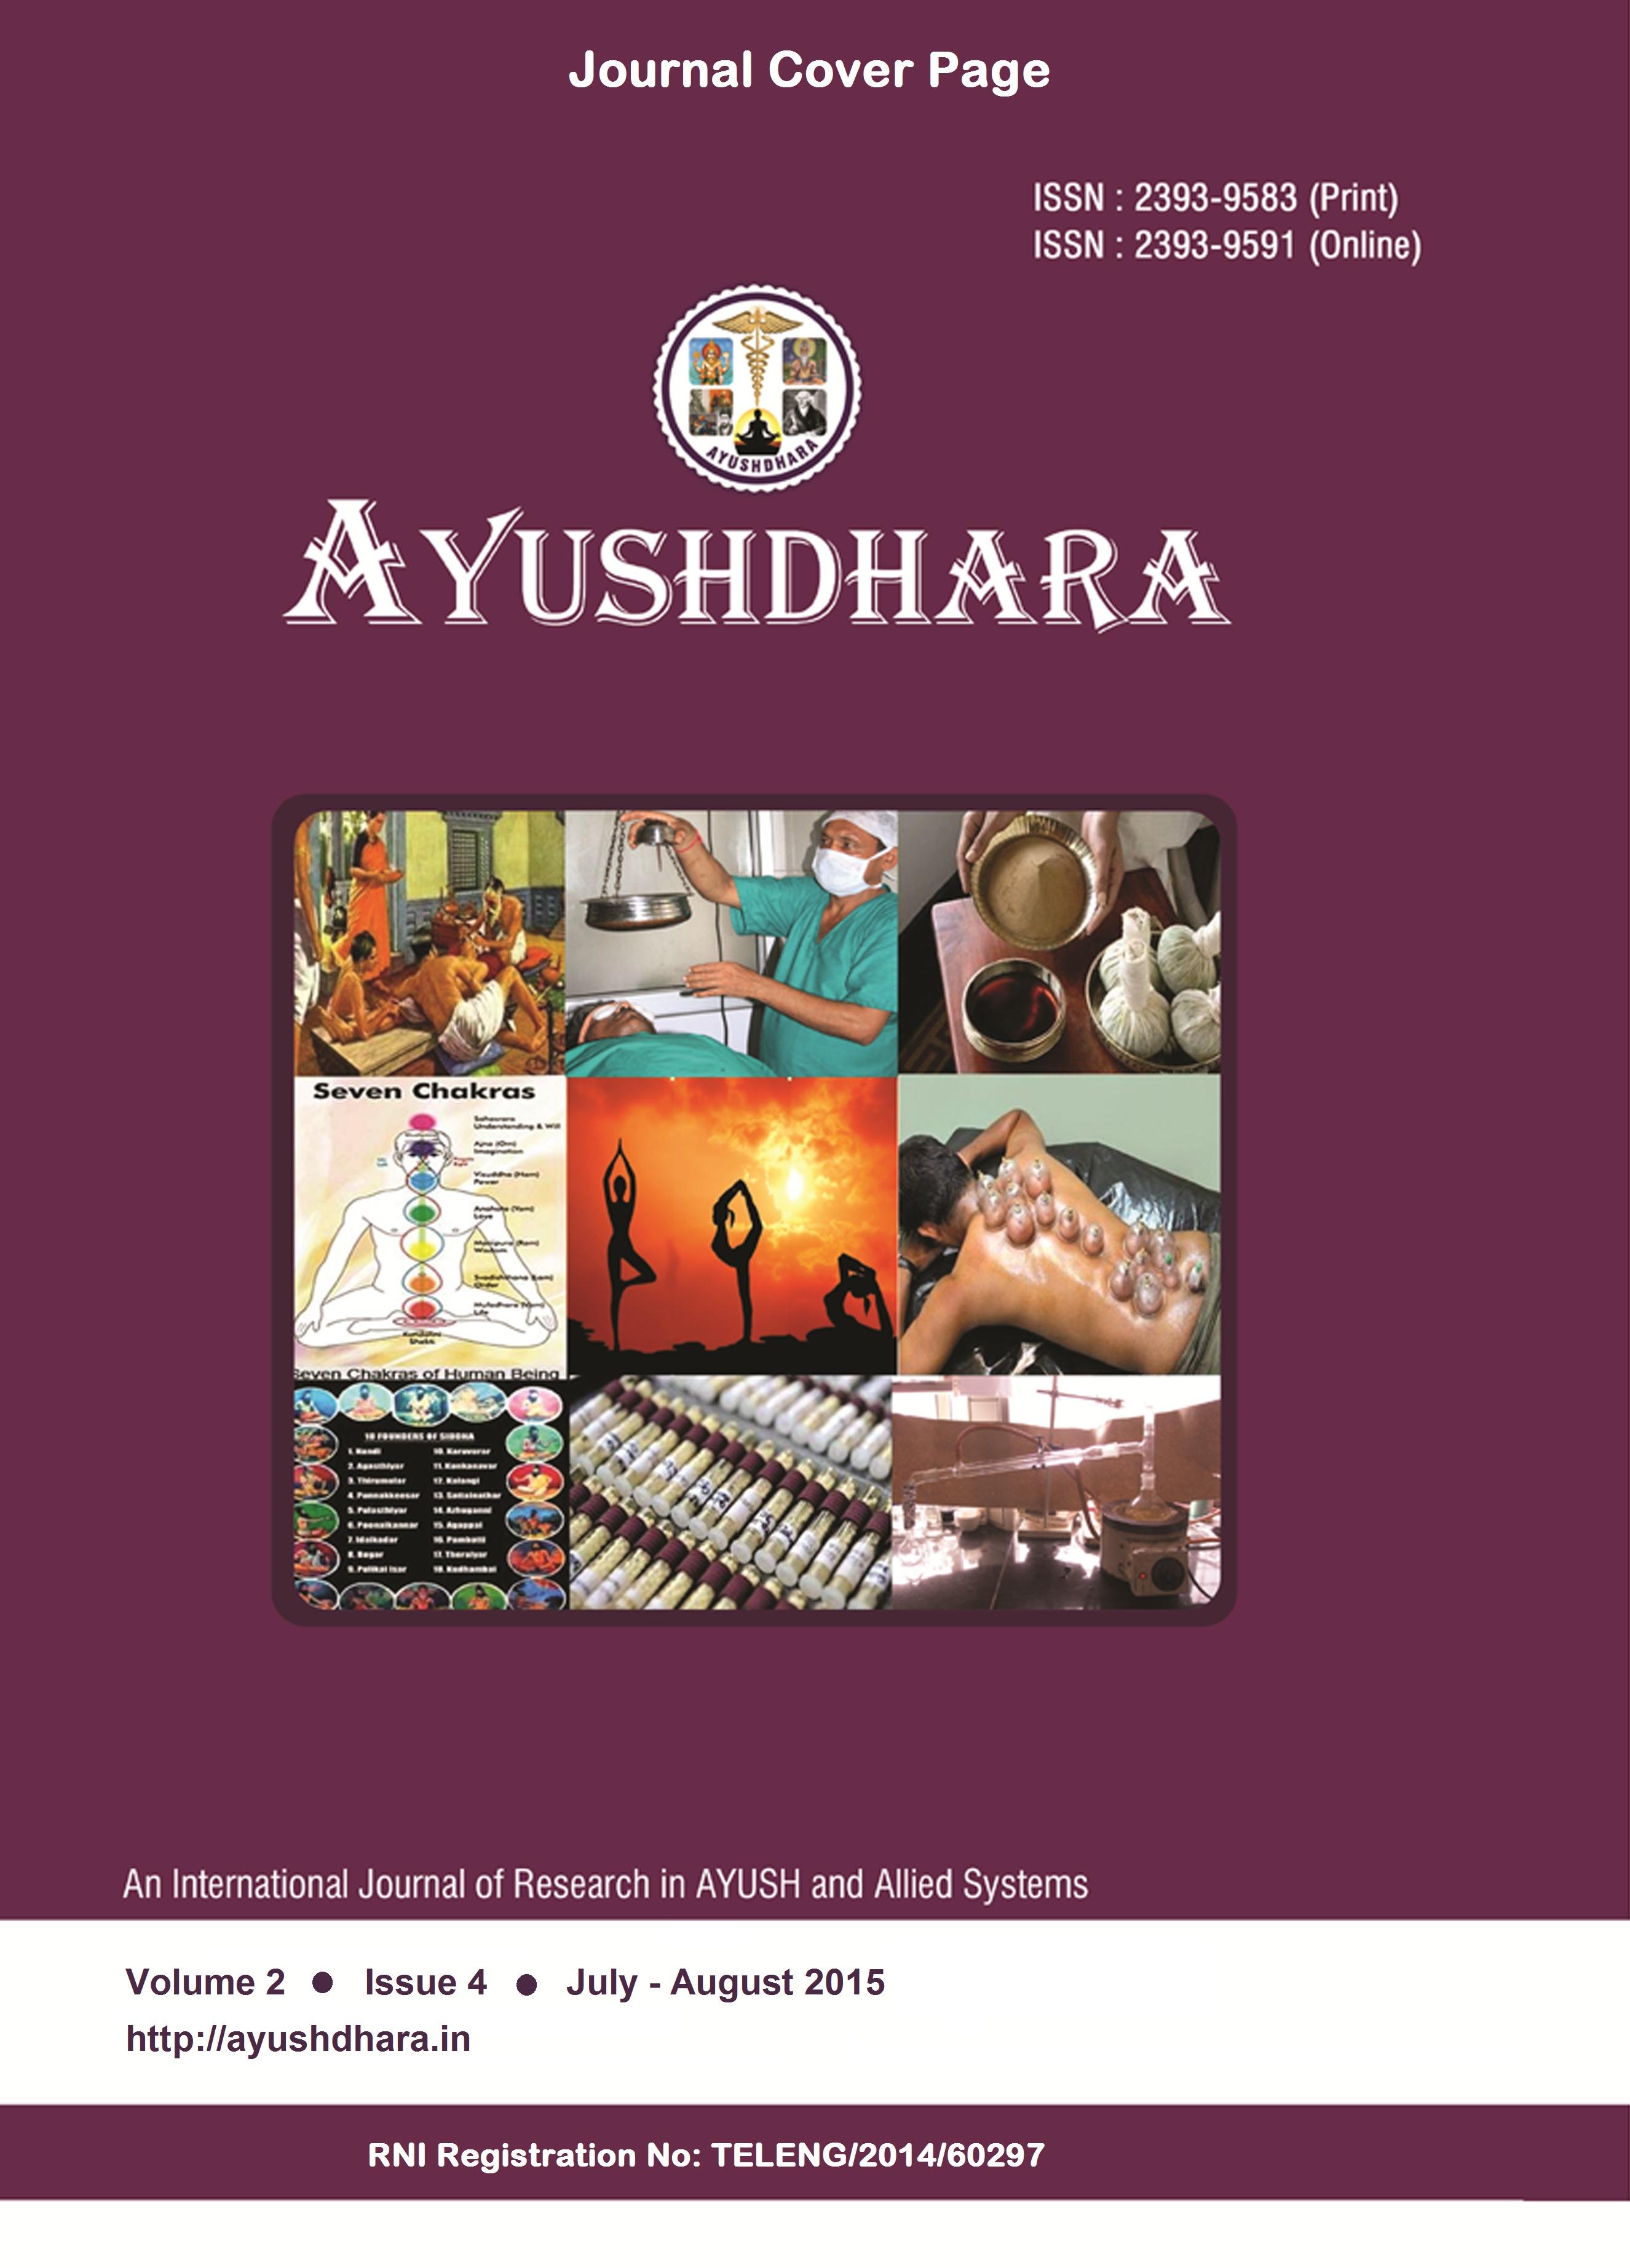 Ayushdhara